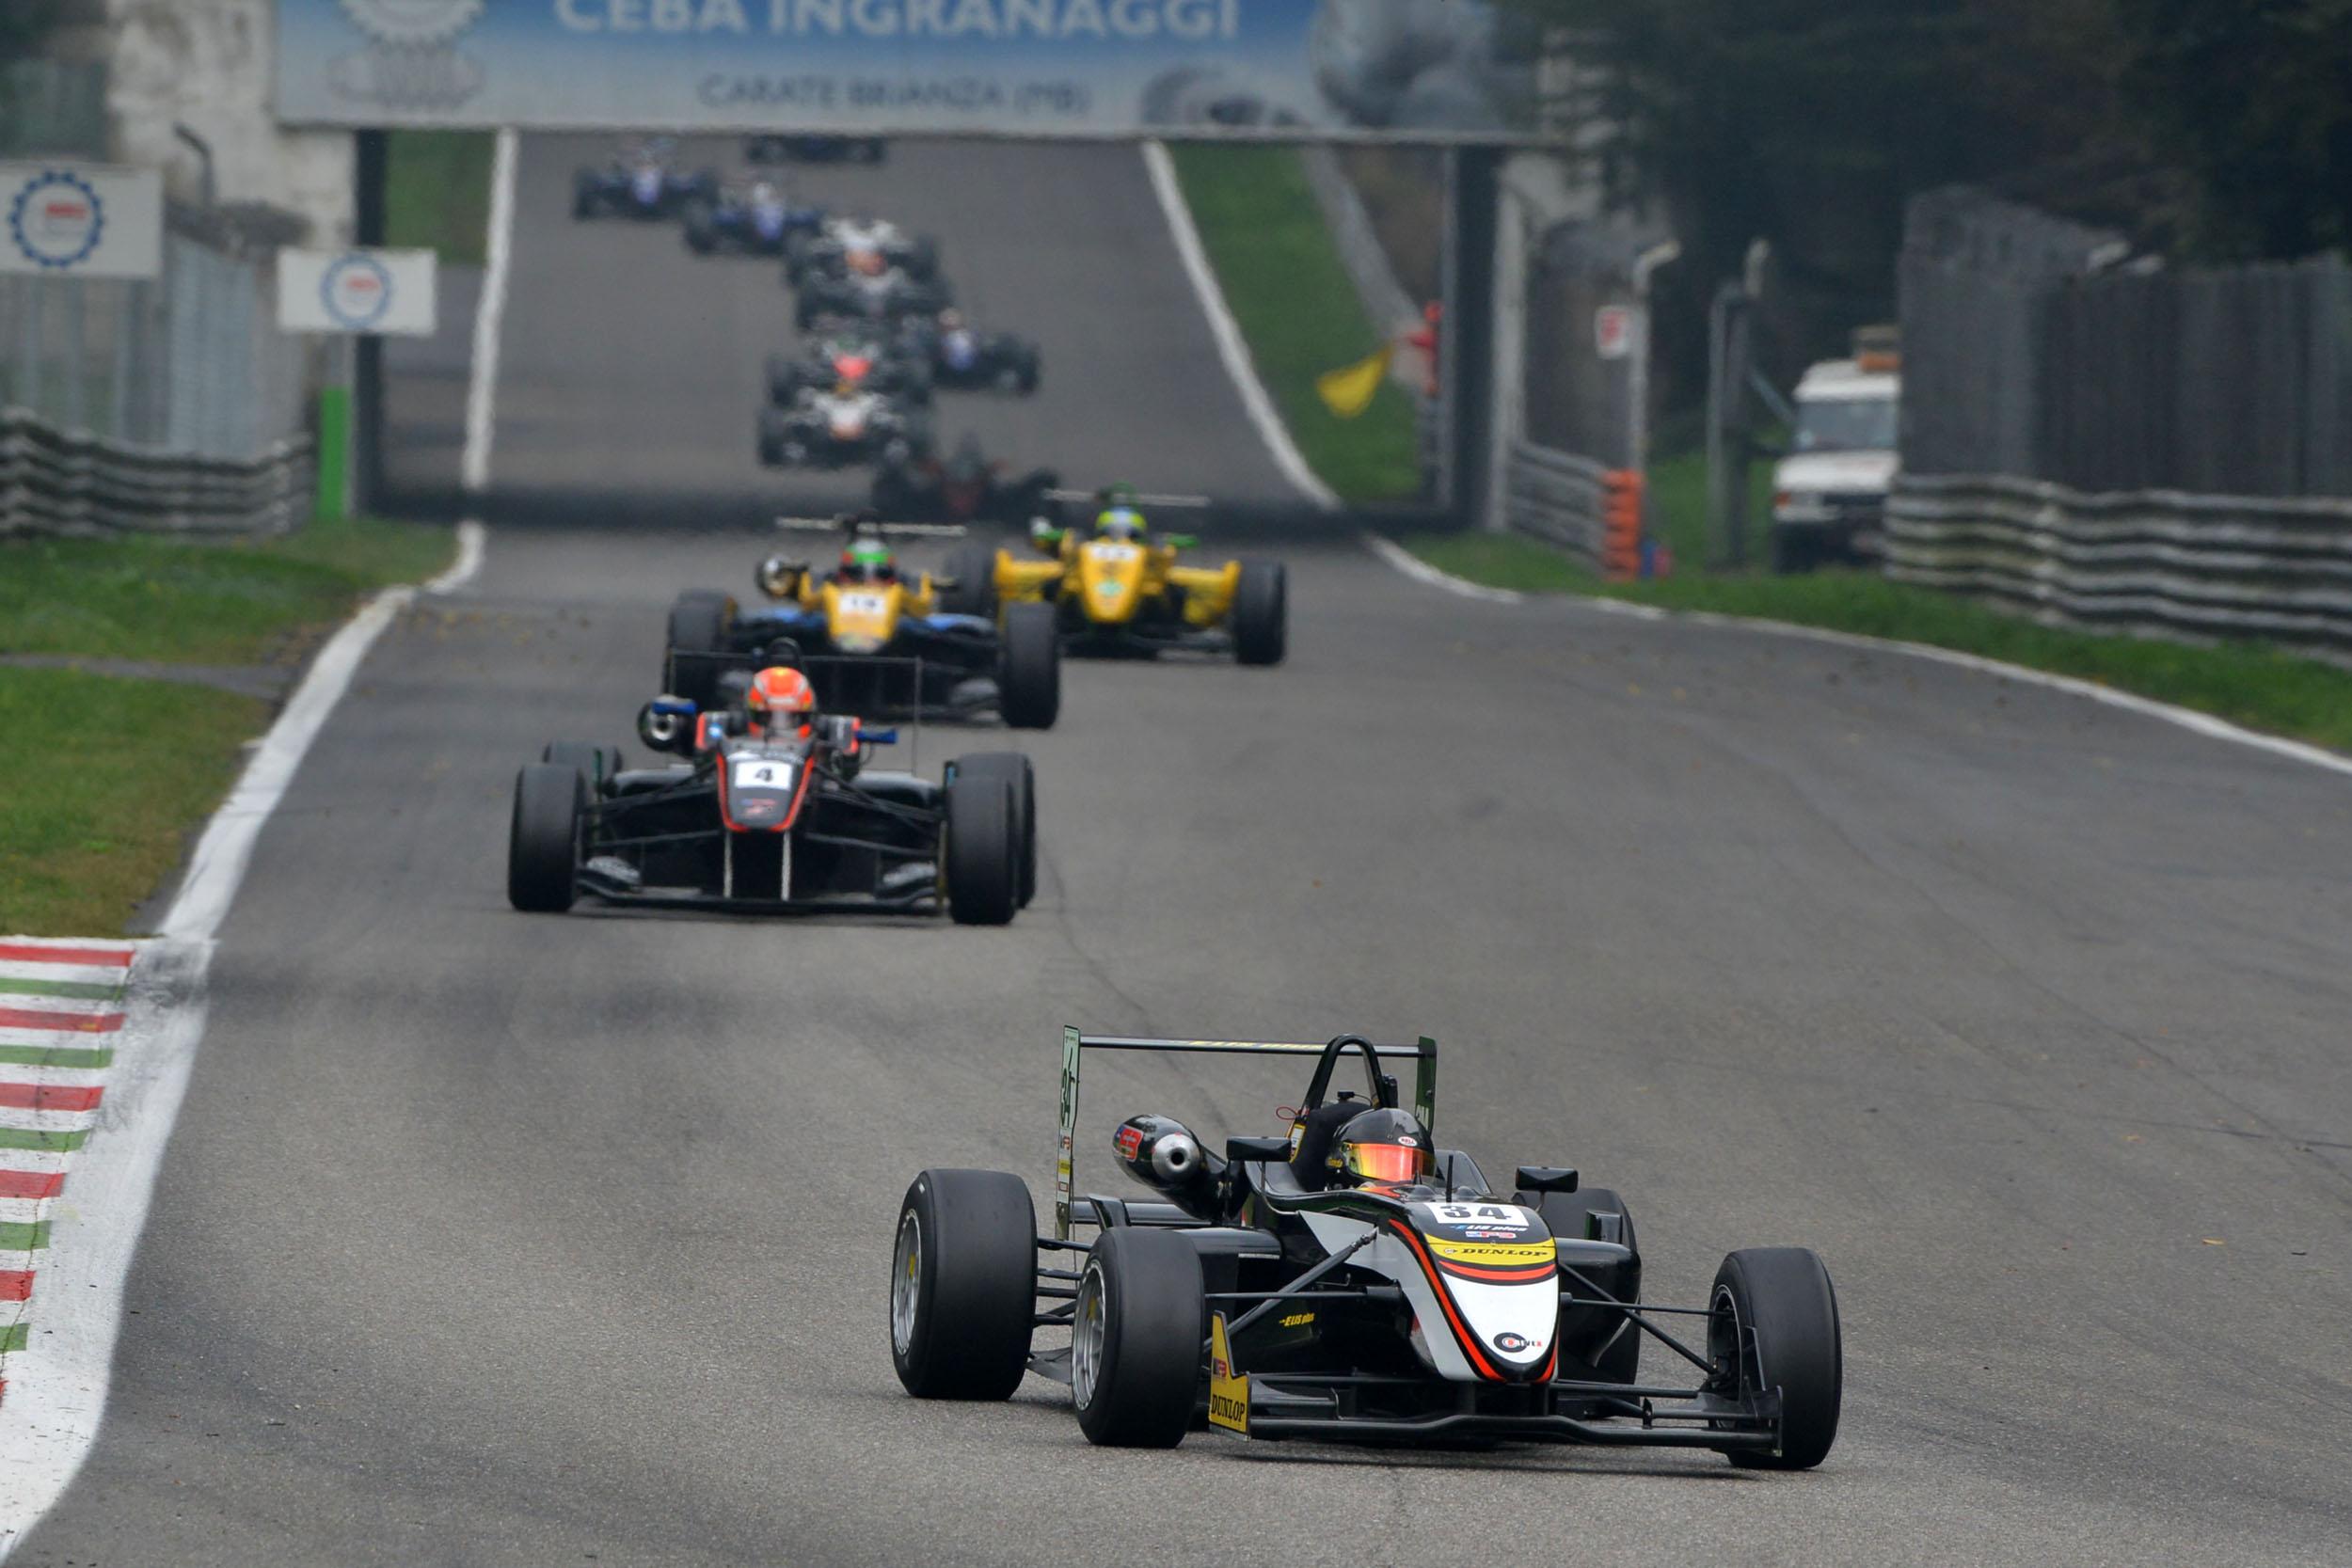 Richard Gonda Monza podium